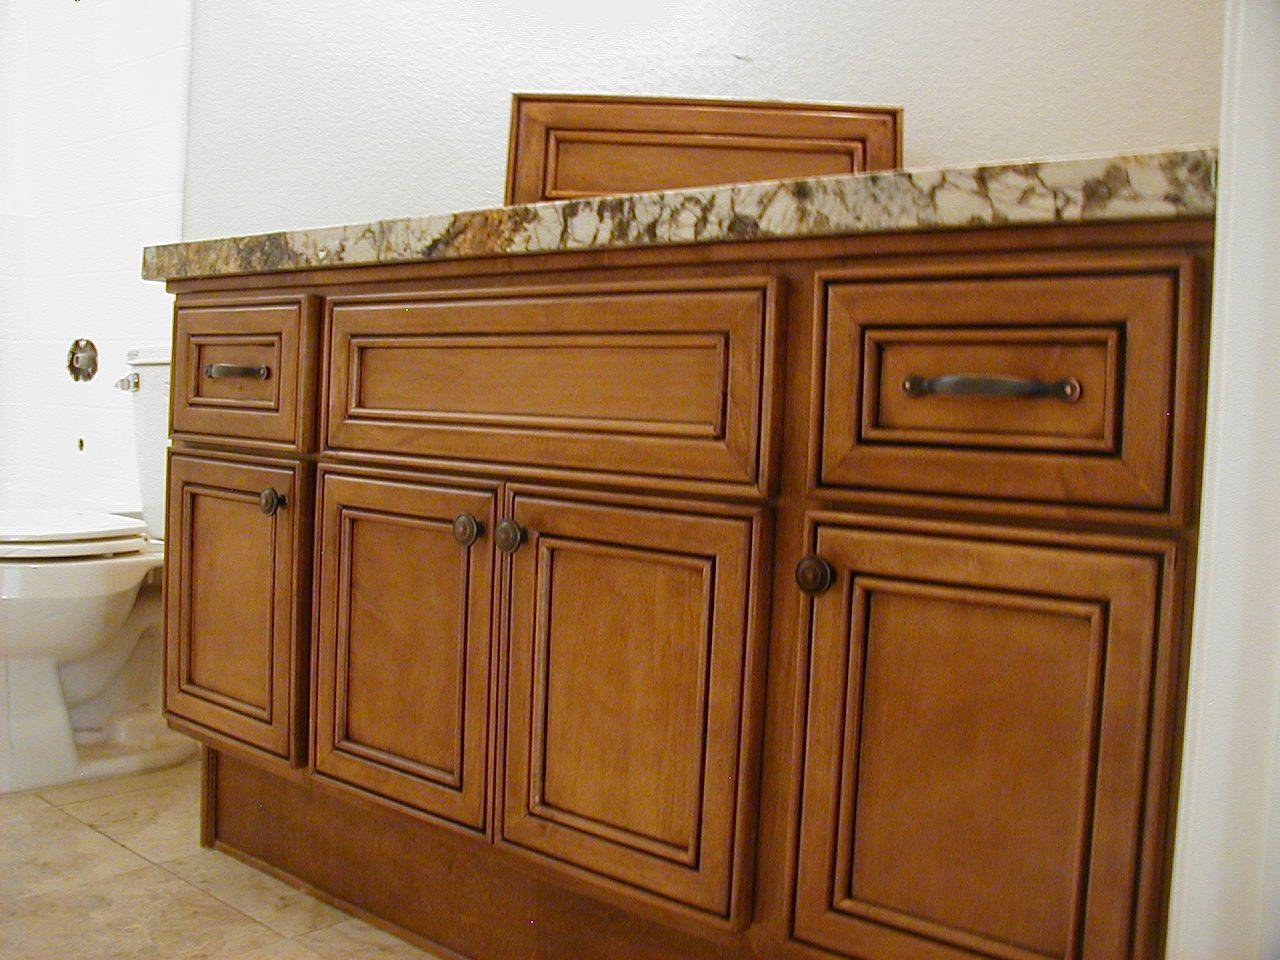 Maple color bathroom cabinets. | Custom bathroom cabinets ... on Bathroom Ideas With Maple Cabinets  id=45589